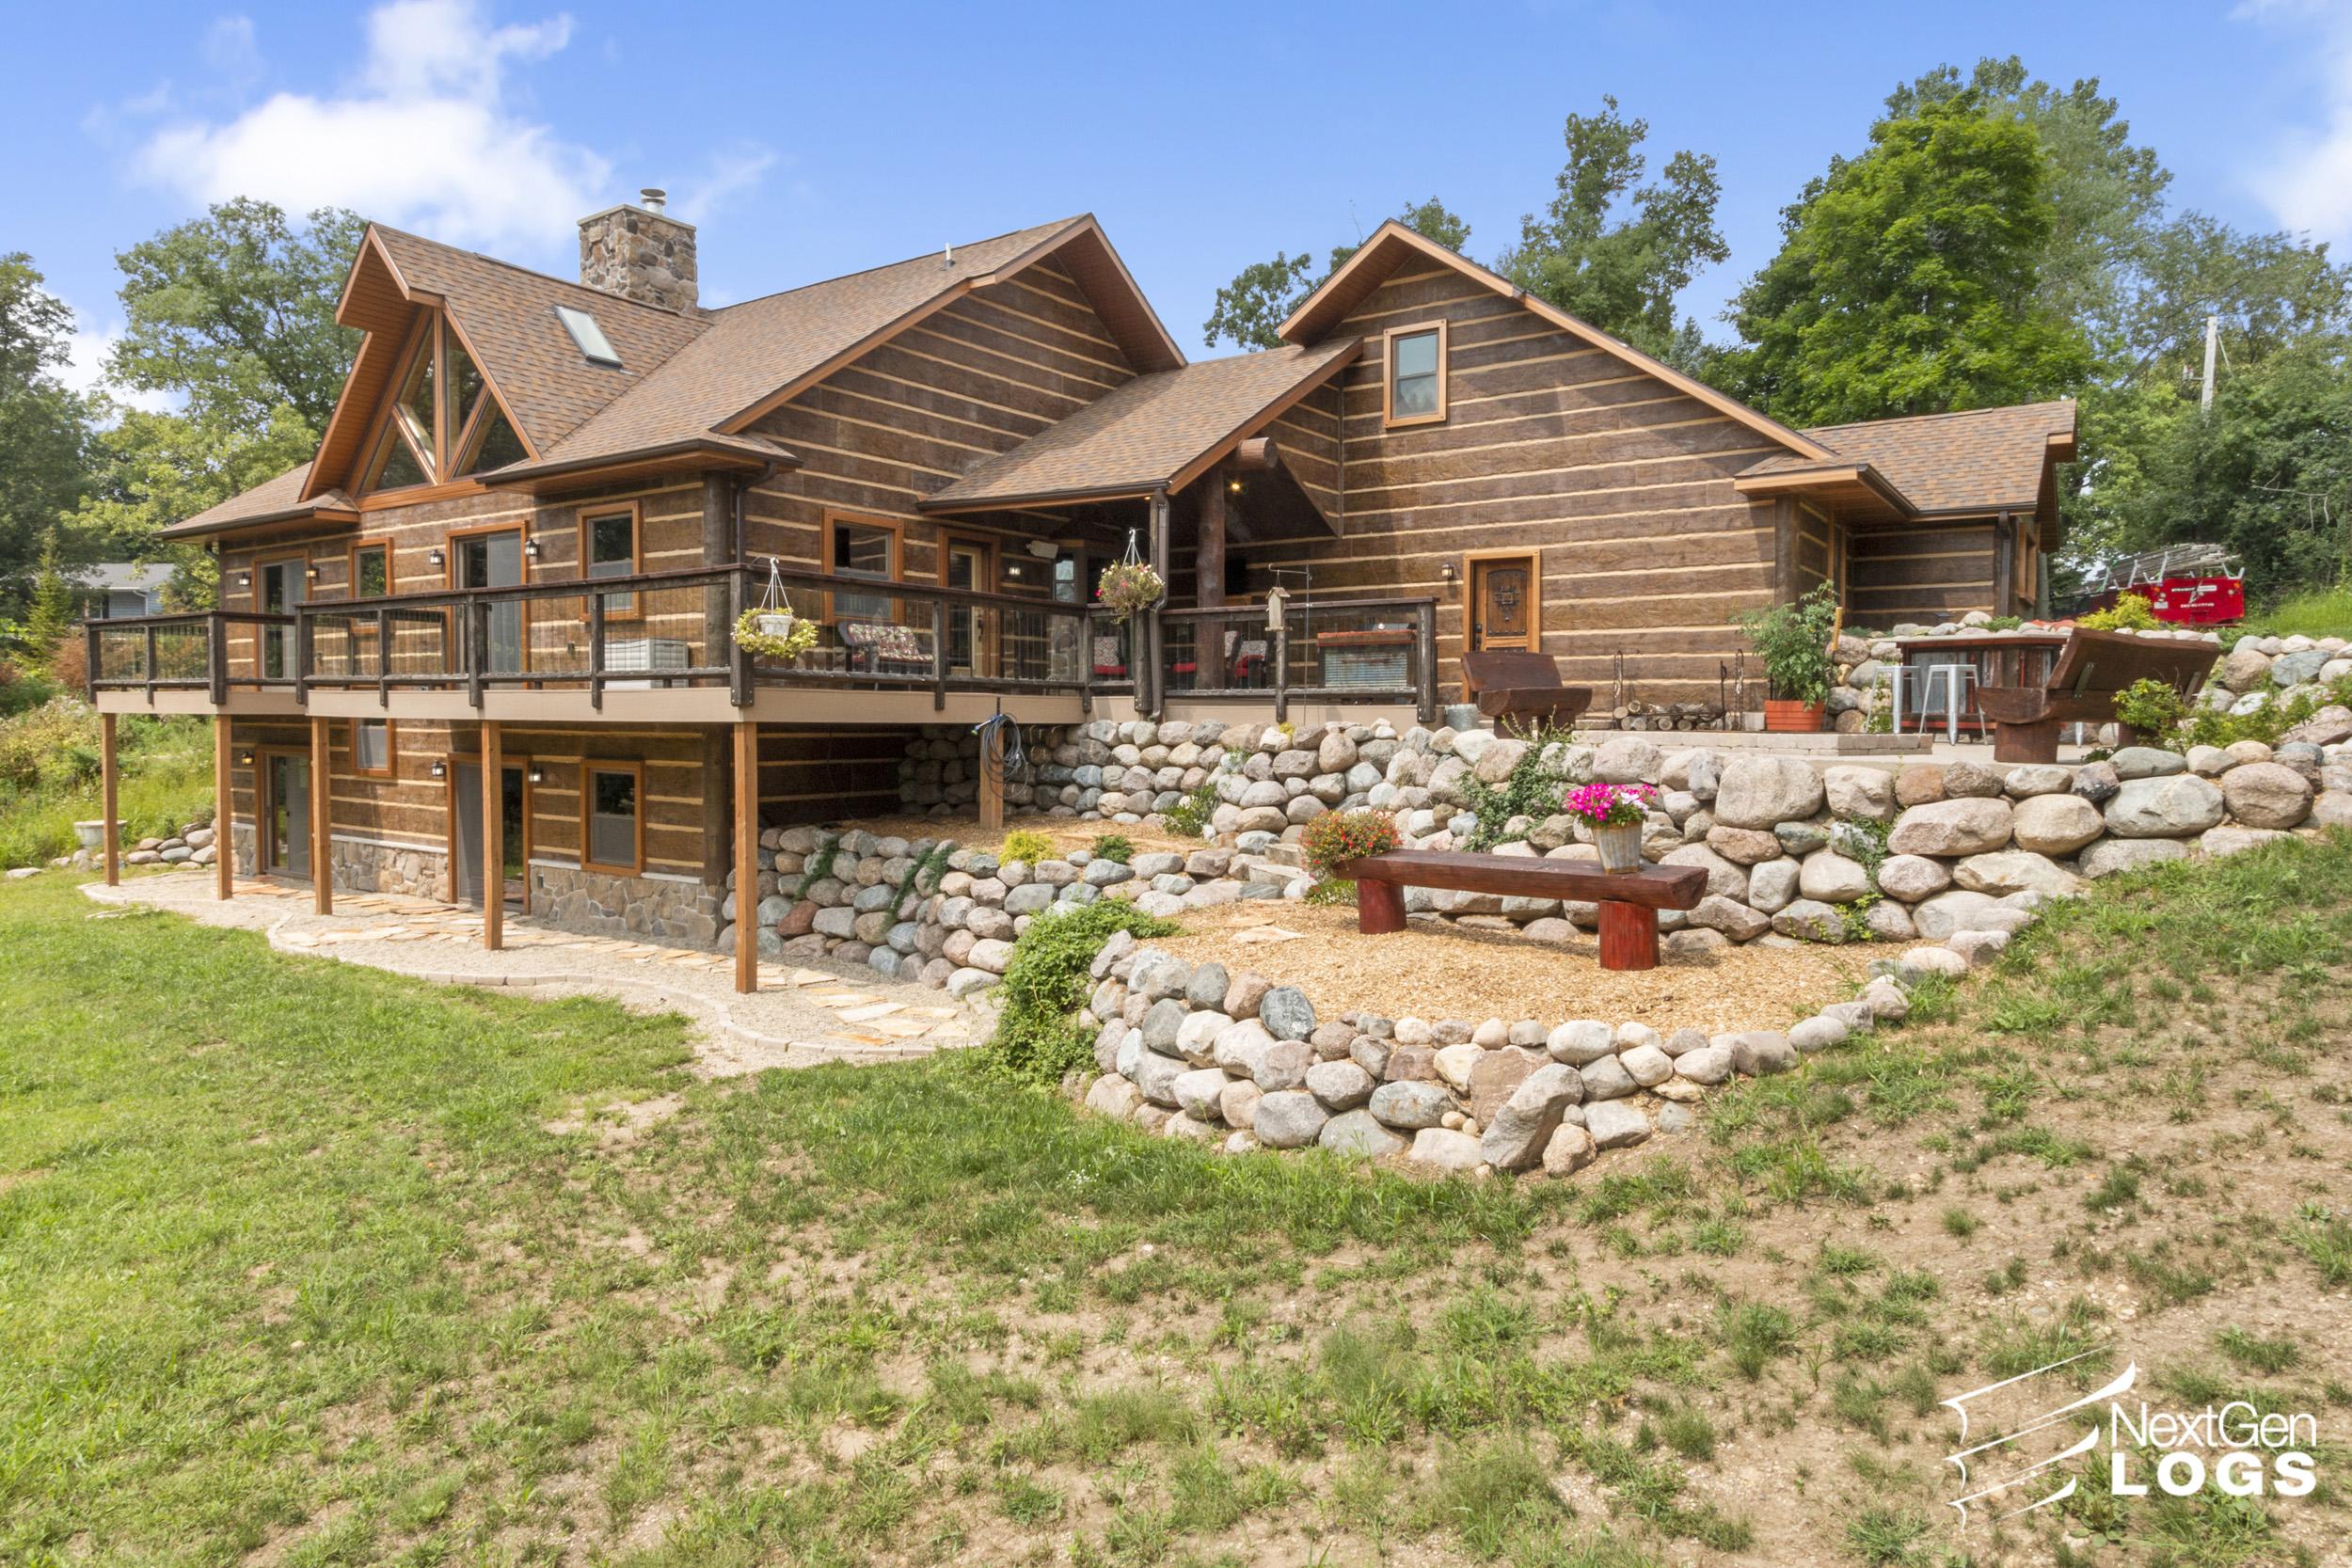 Elkhorn Wi Hand Hewn Sided Home Nextgen Logs